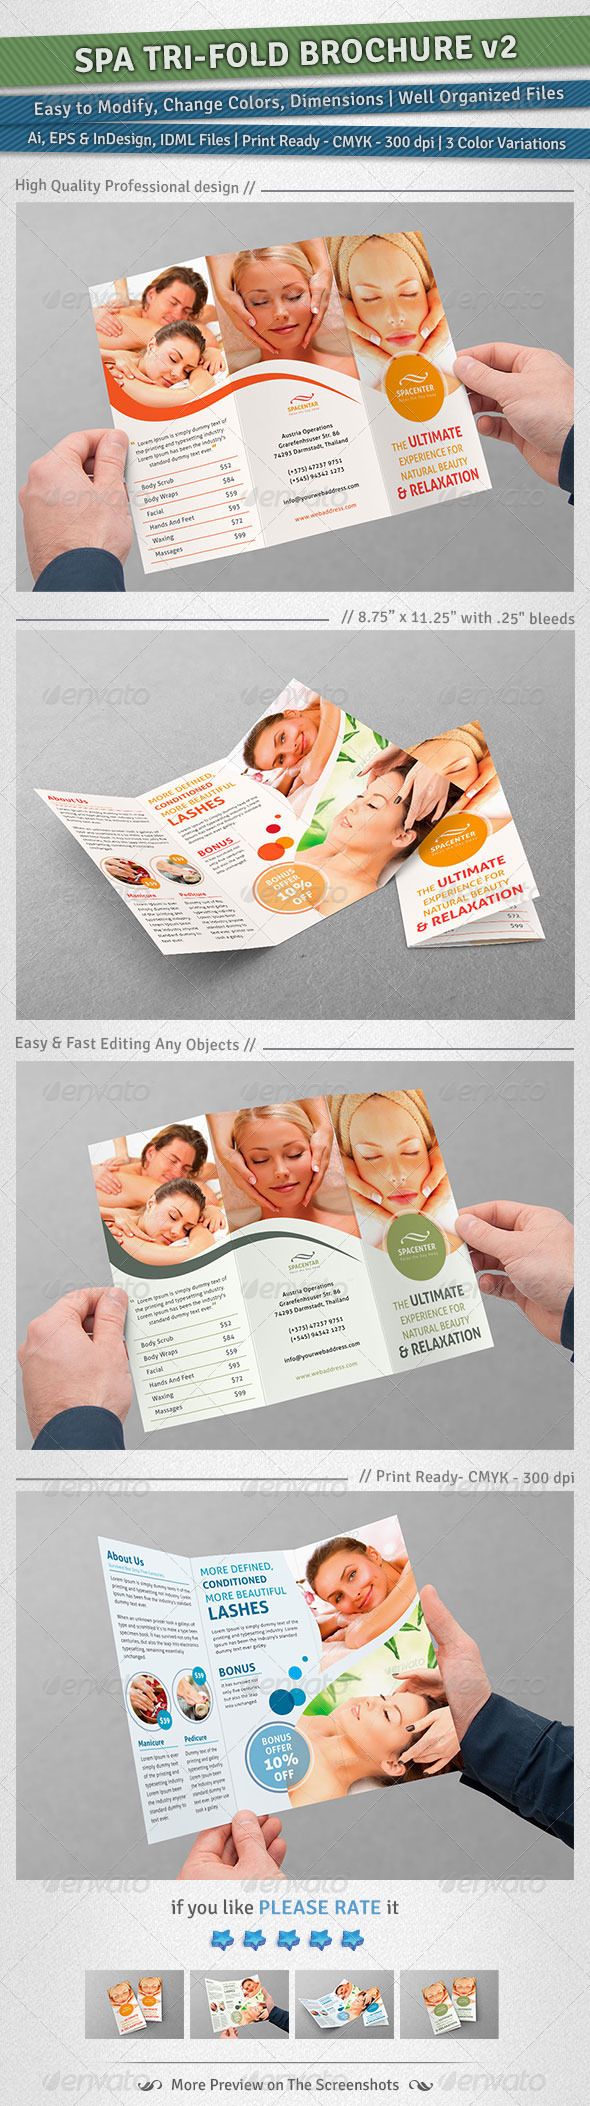 Spa Tri-Fold Brochure | Volume 2 - Corporate Brochures